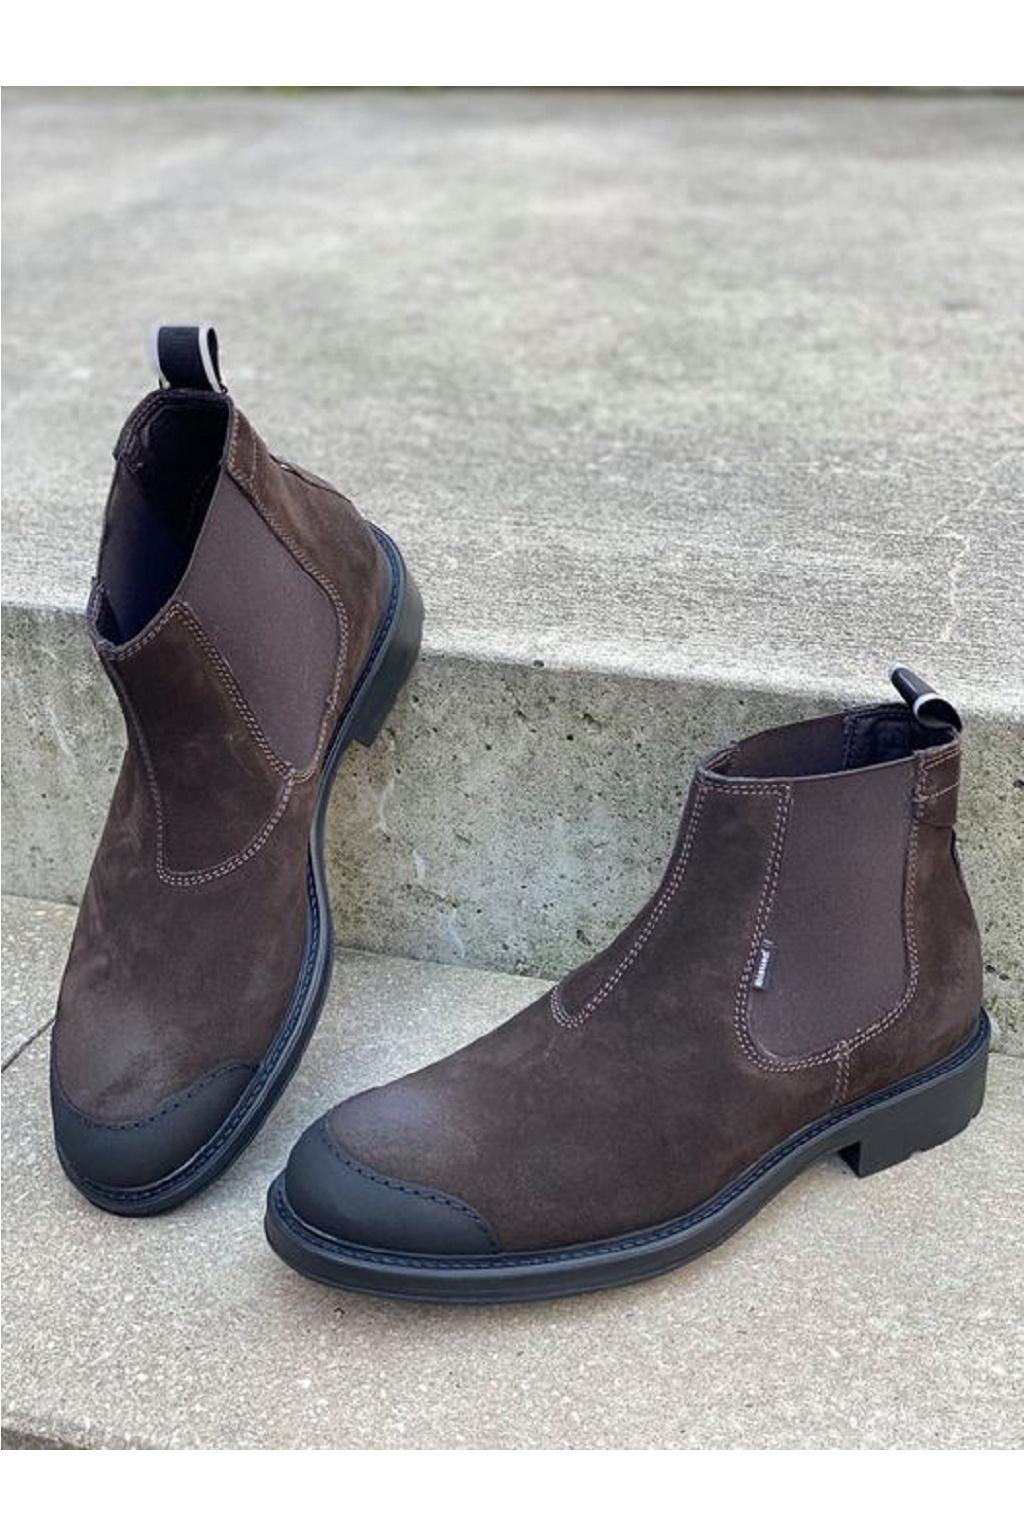 Pánká obuv Blauer F1HAYWARD05/SUE hnědá